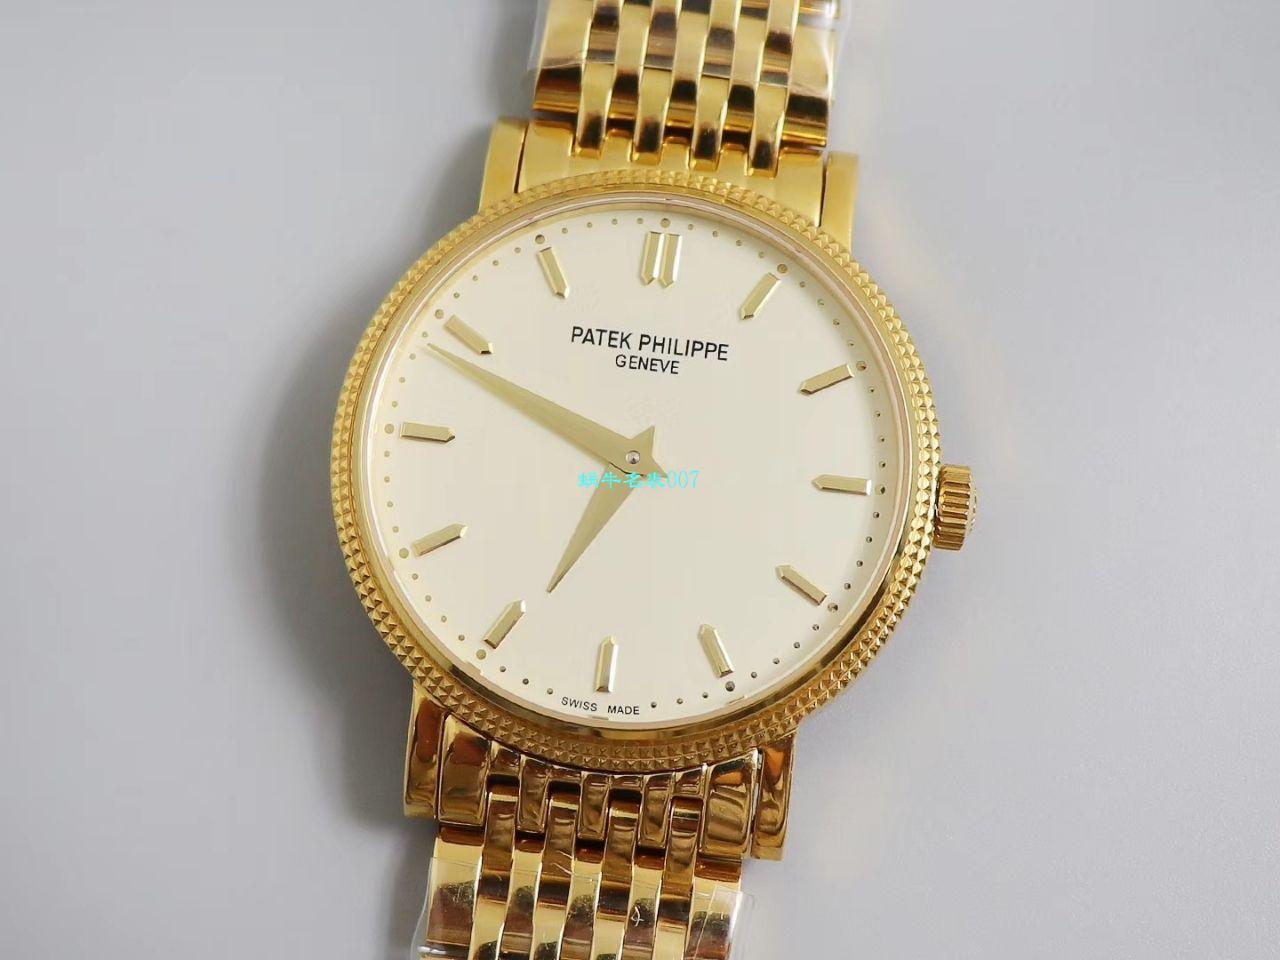 TW厂顶级复刻表百达翡丽古典表系列5120J-00,5120G-001腕表